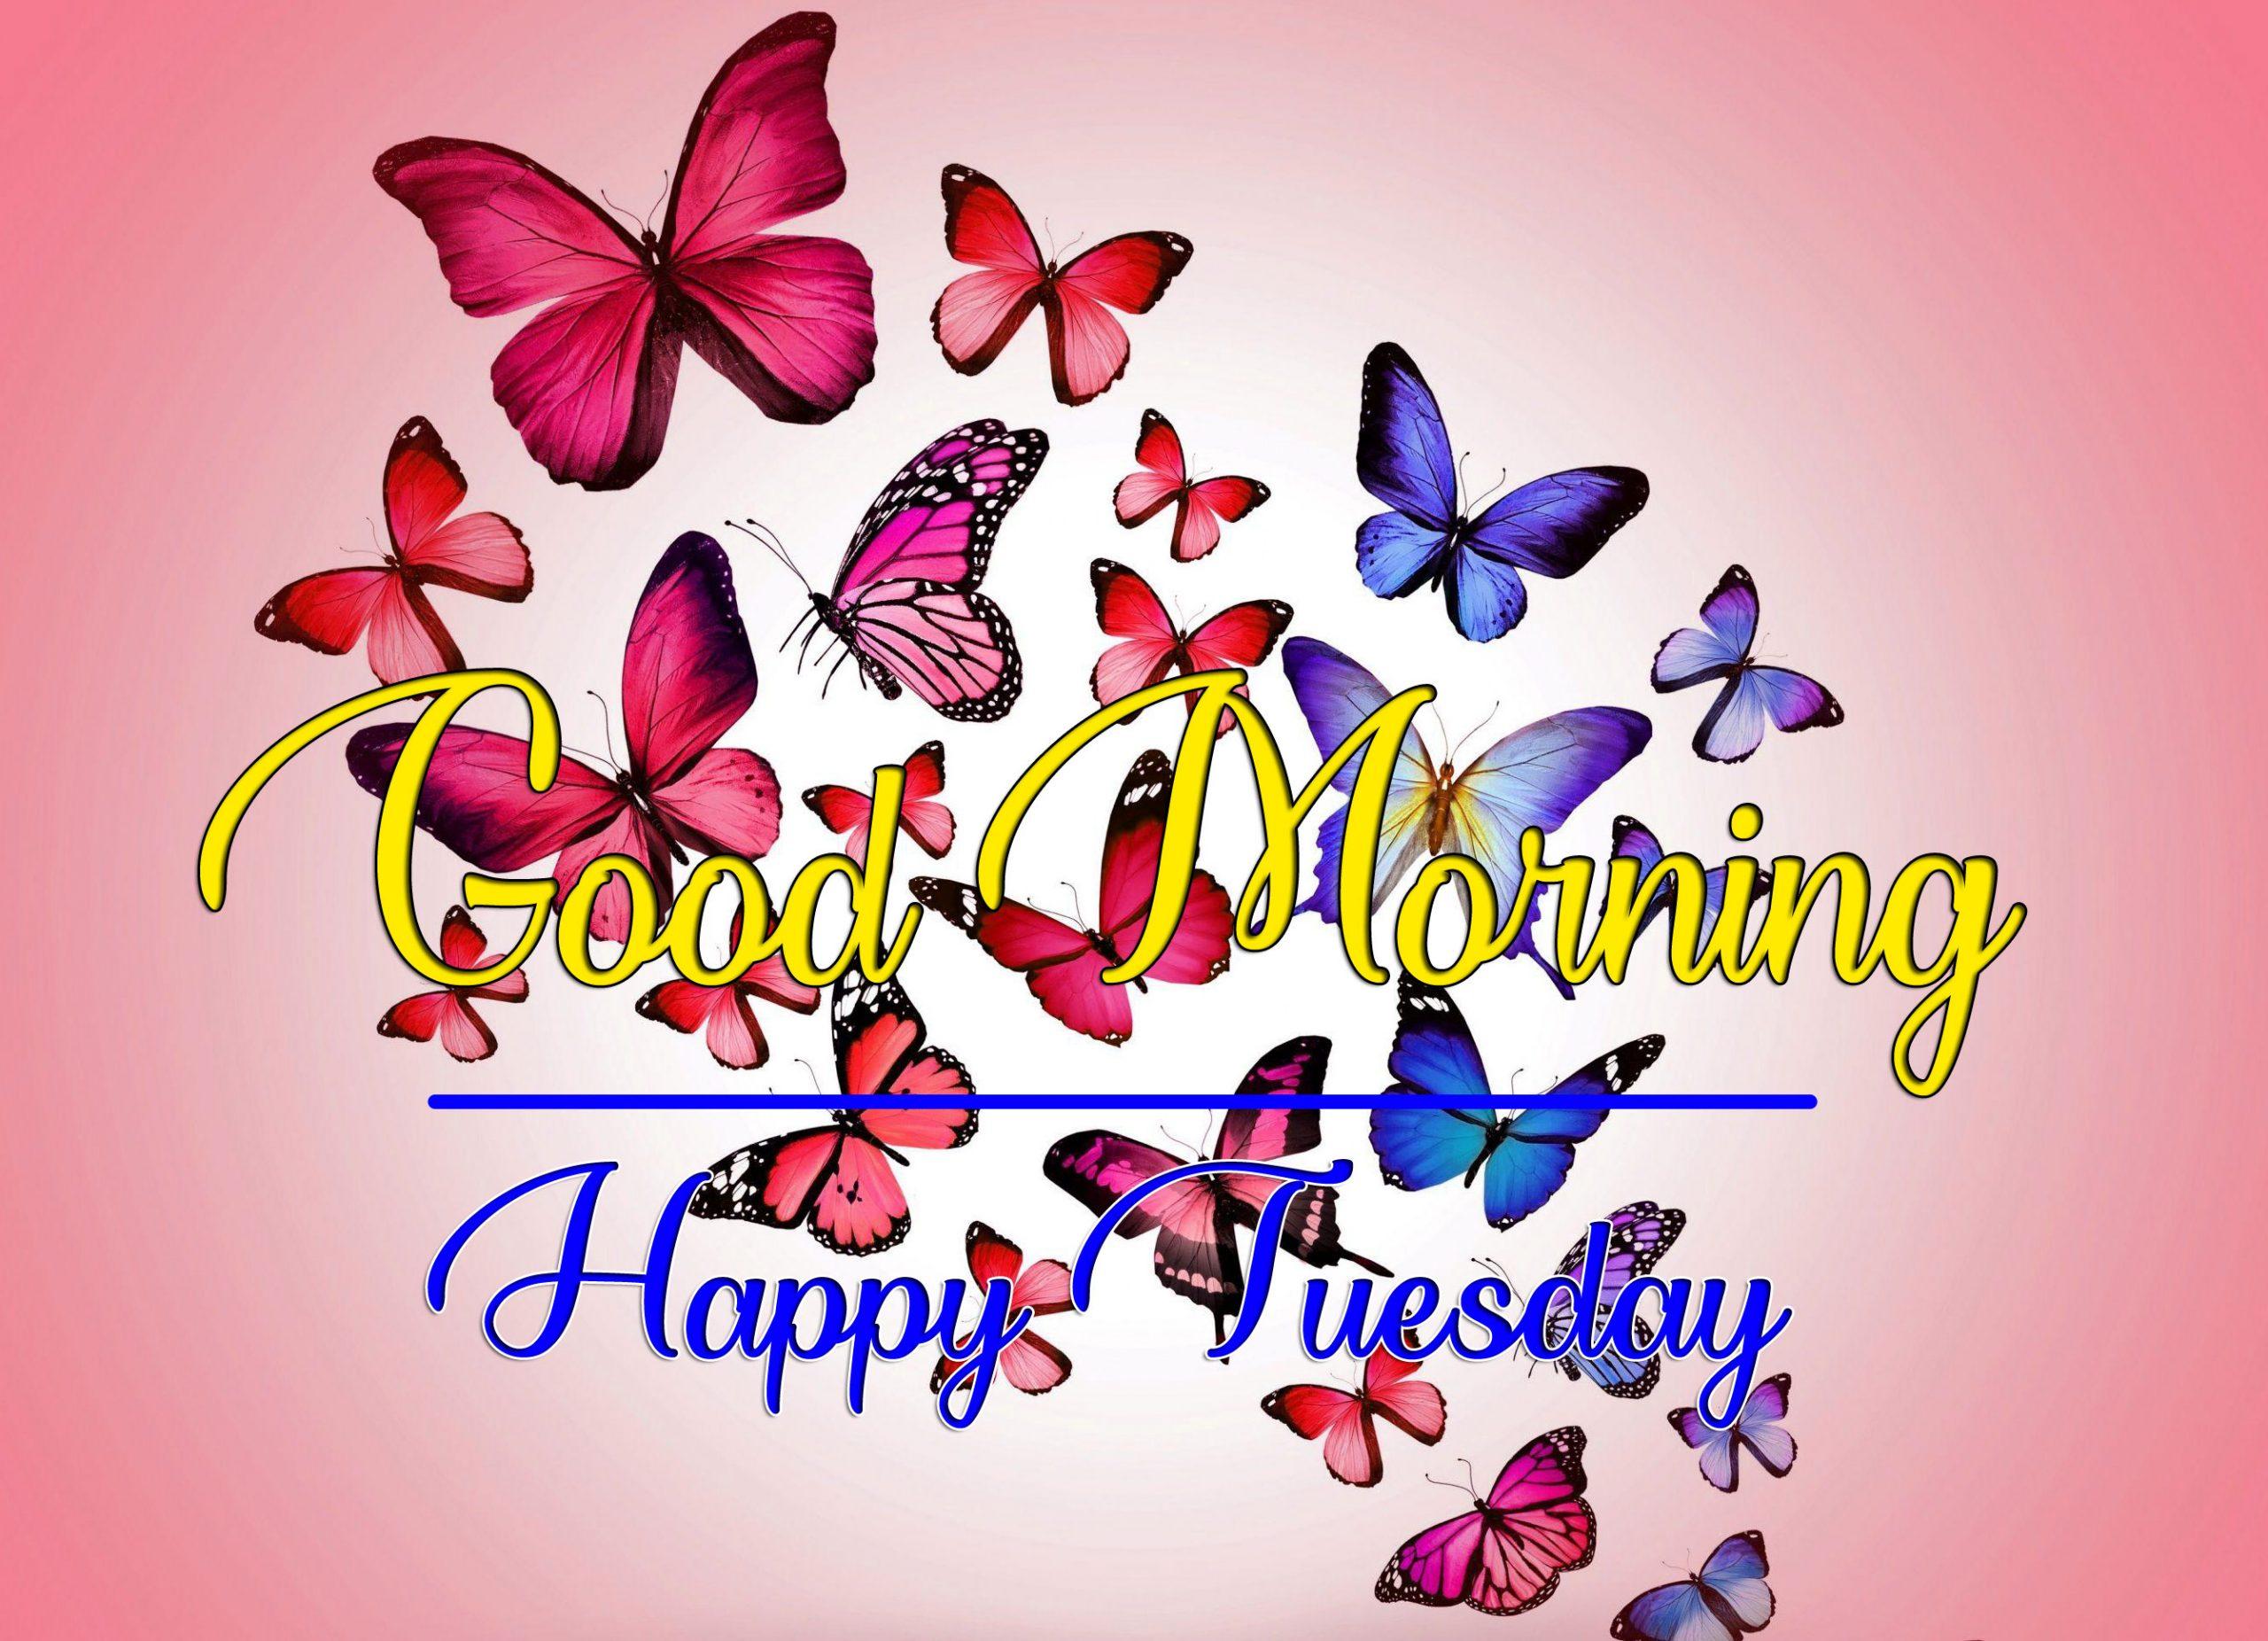 Fresh Beautiful Tuesday Good morning Images